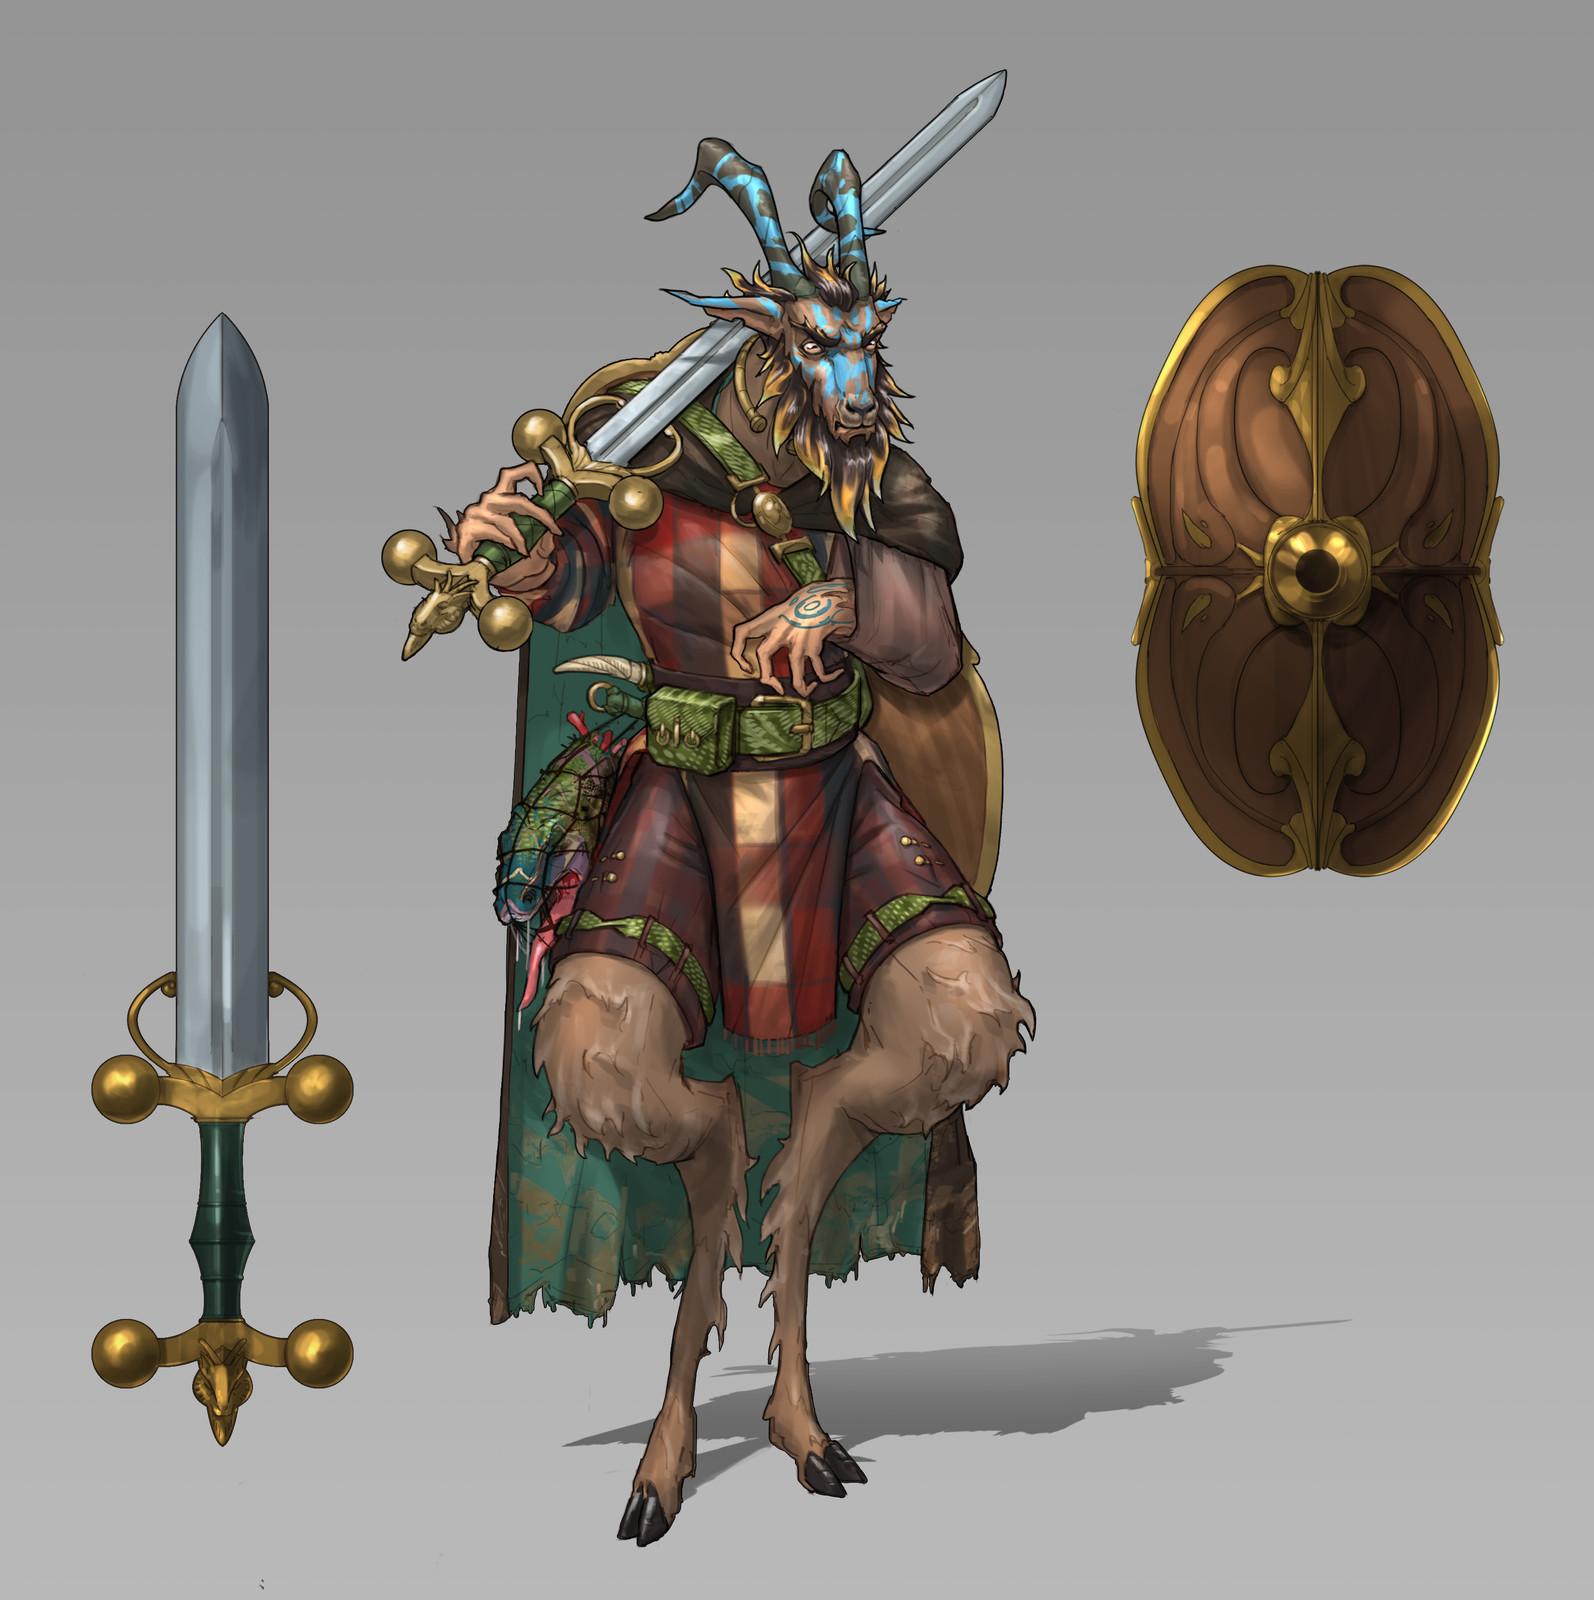 Goat Swordsman